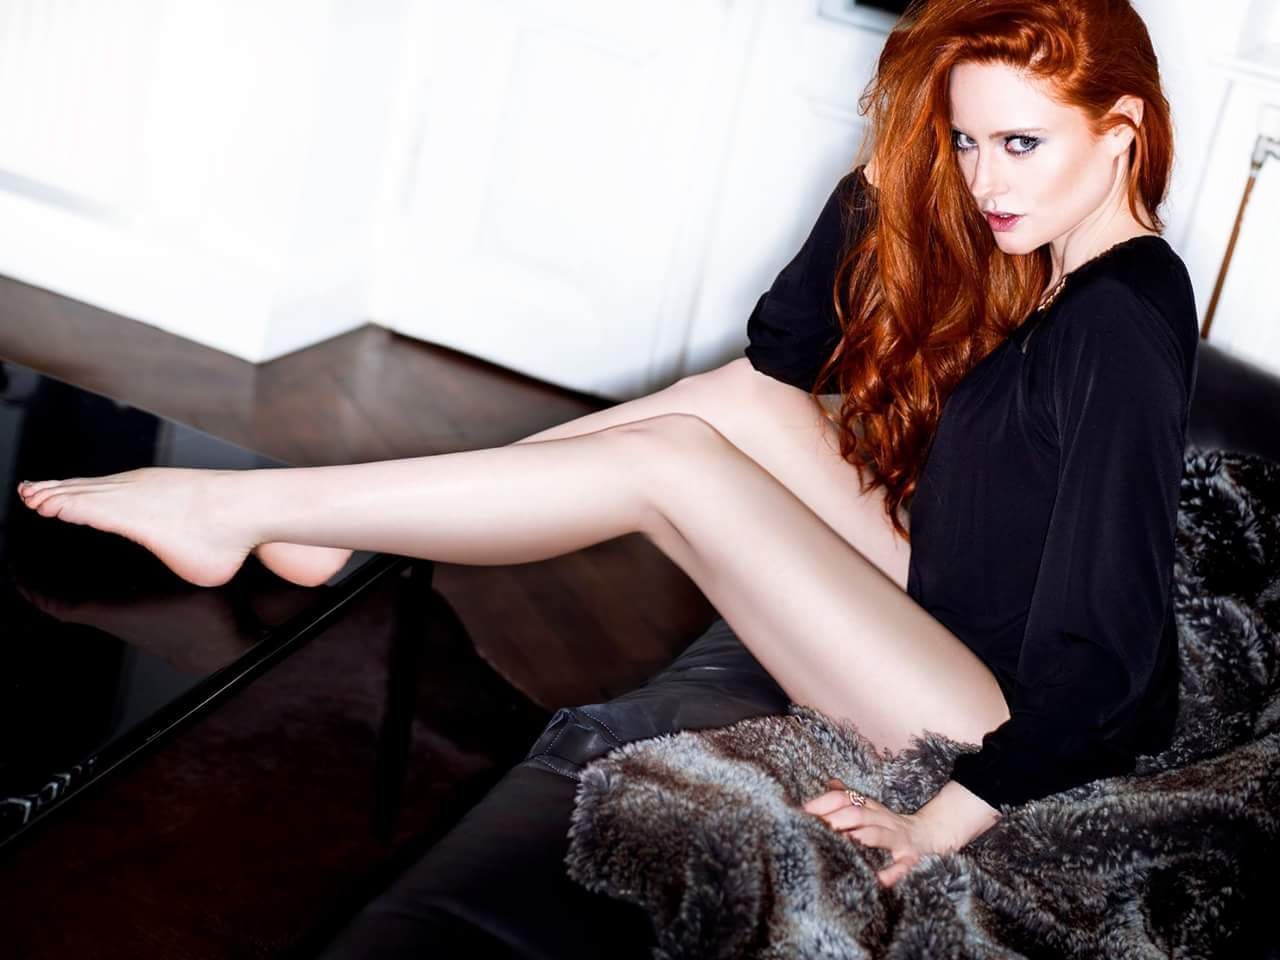 Celebrity Barbara Meier nudes (71 photo), Ass, Cleavage, Feet, butt 2018